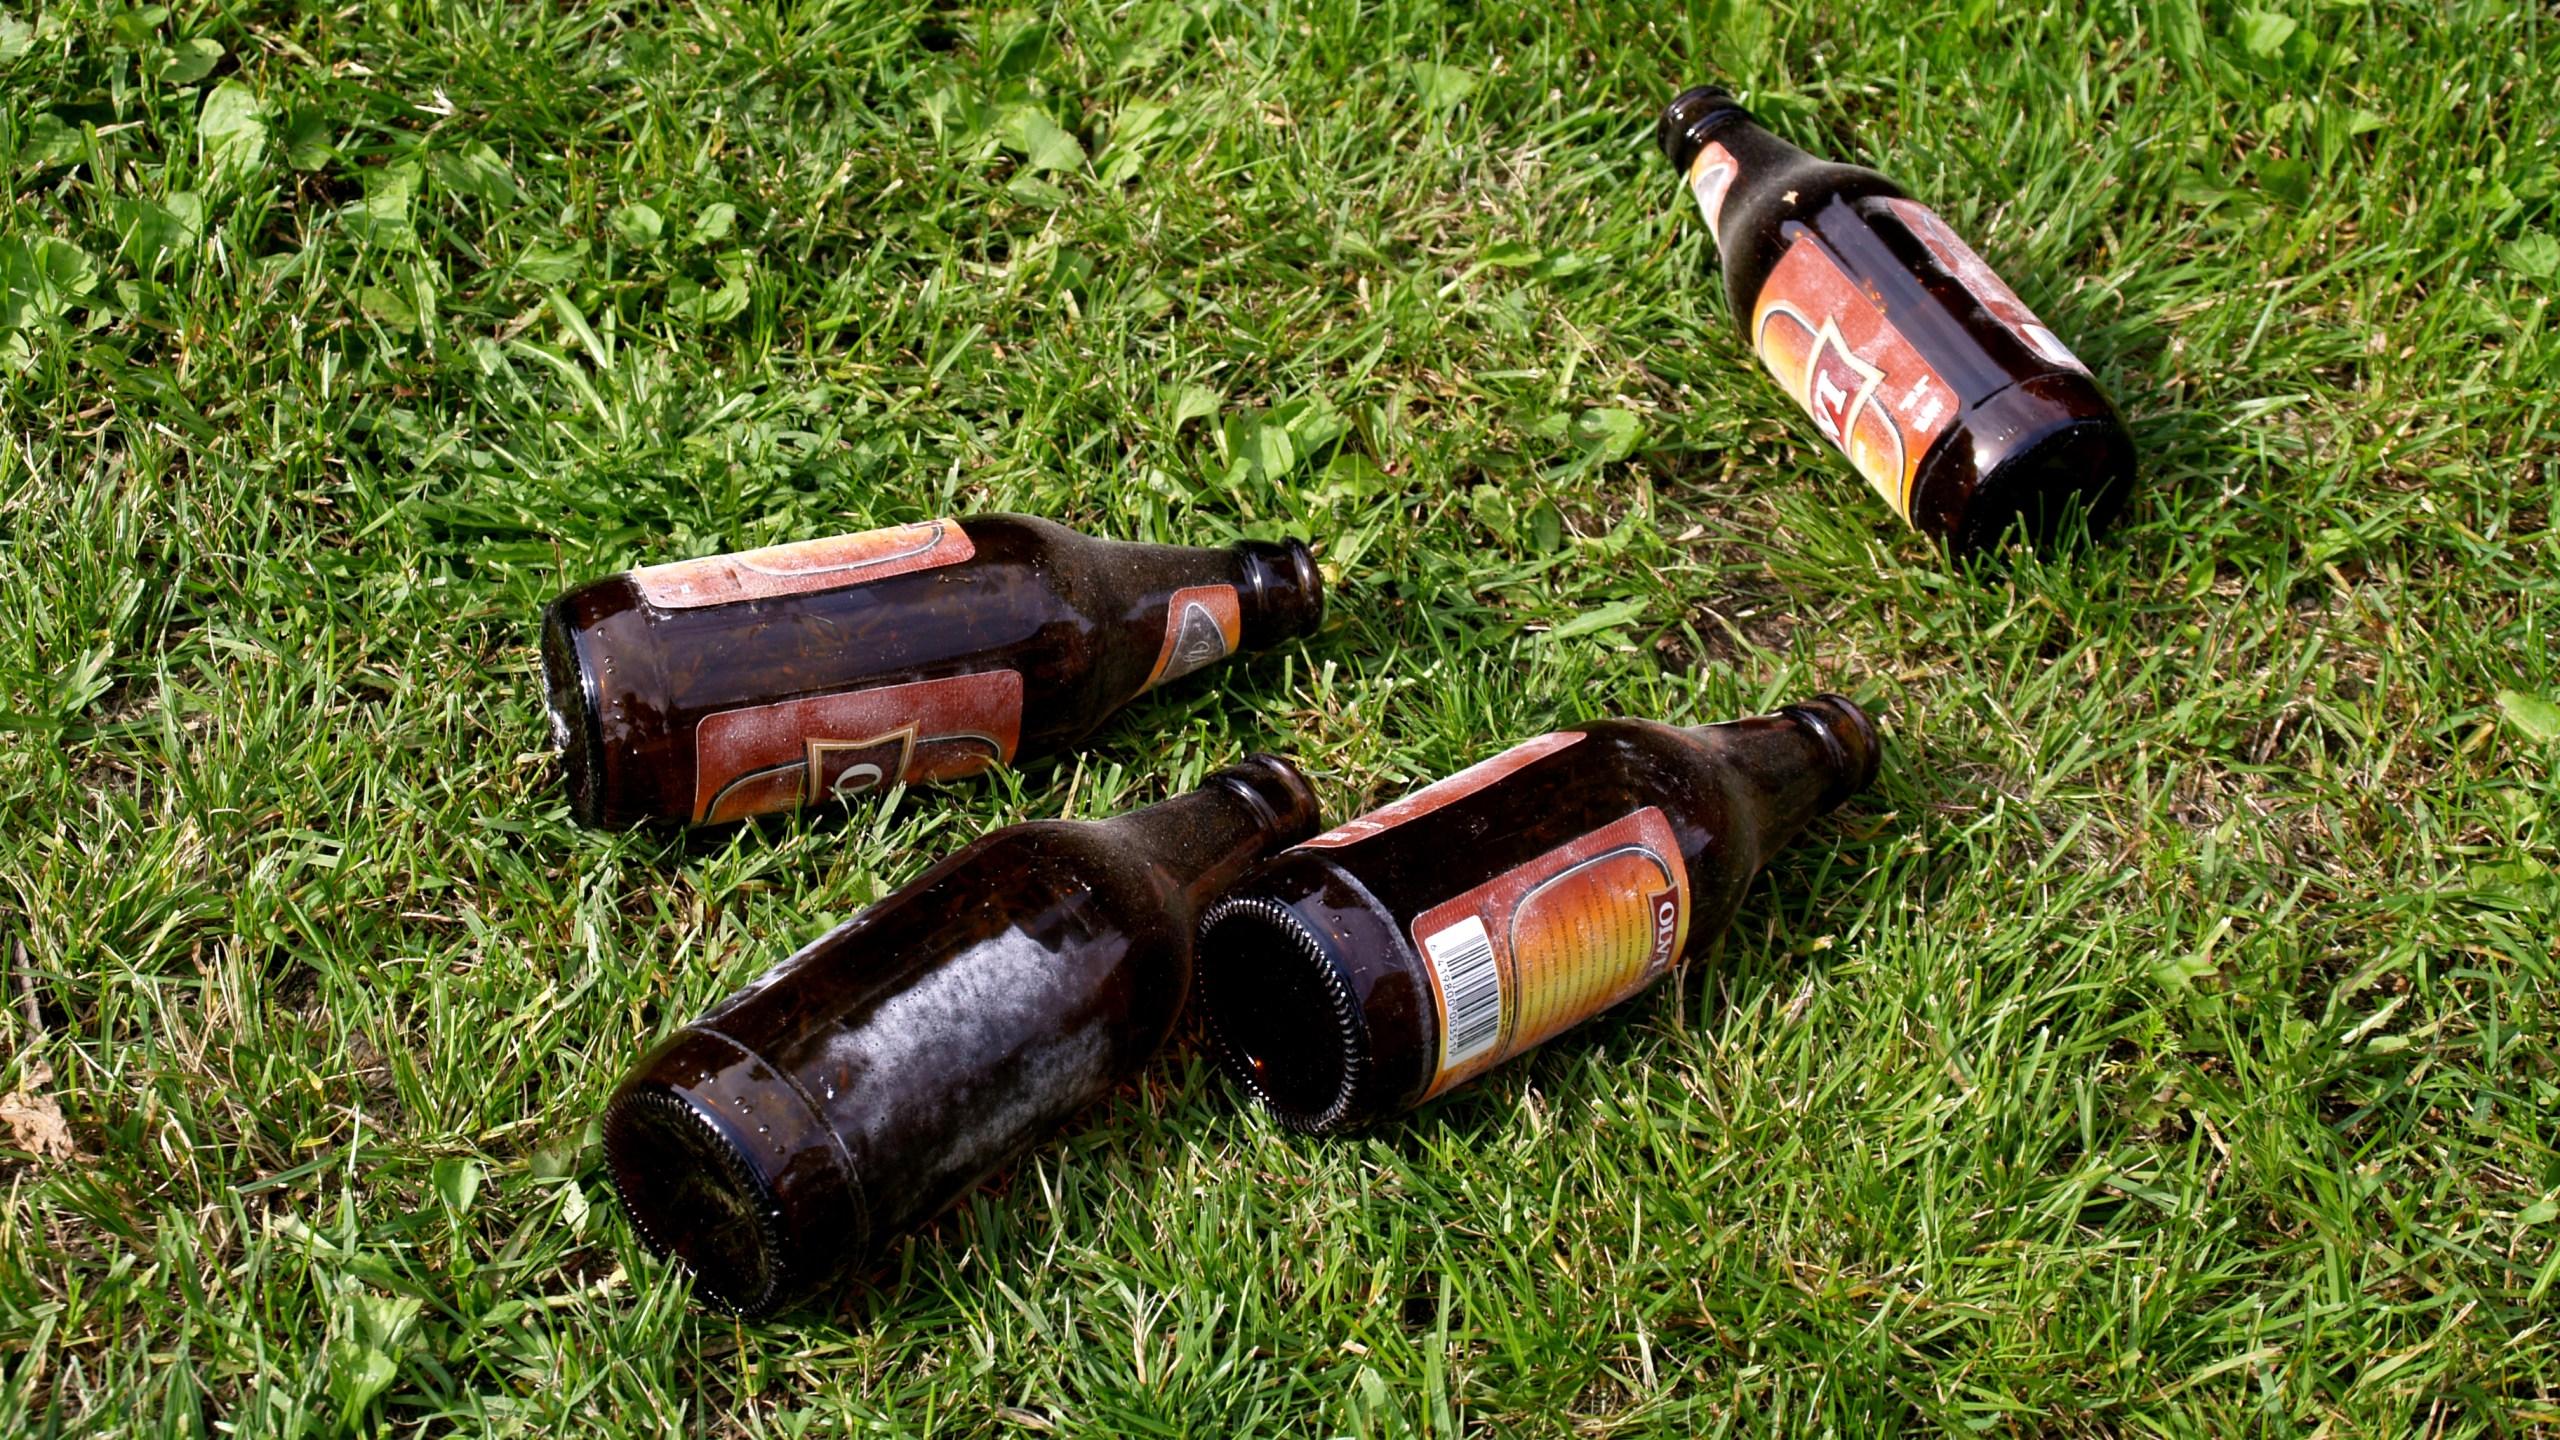 Empty beer bottles on grass_1547571822268